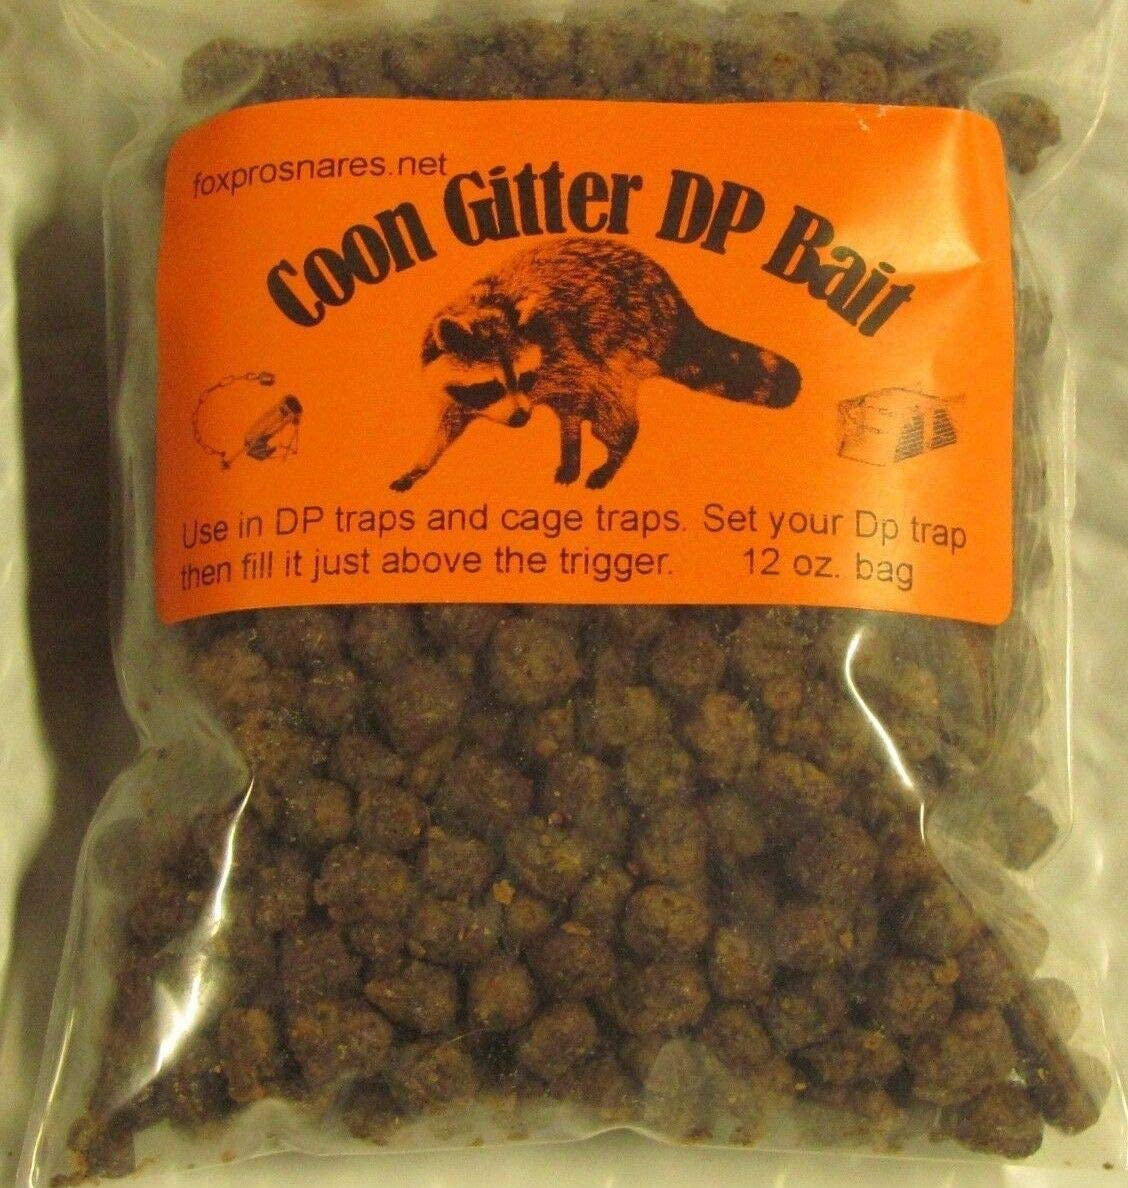 Coon Gitter Bait Works Good in Dp & cage Traps Nuisance, (12 oz. Bag)